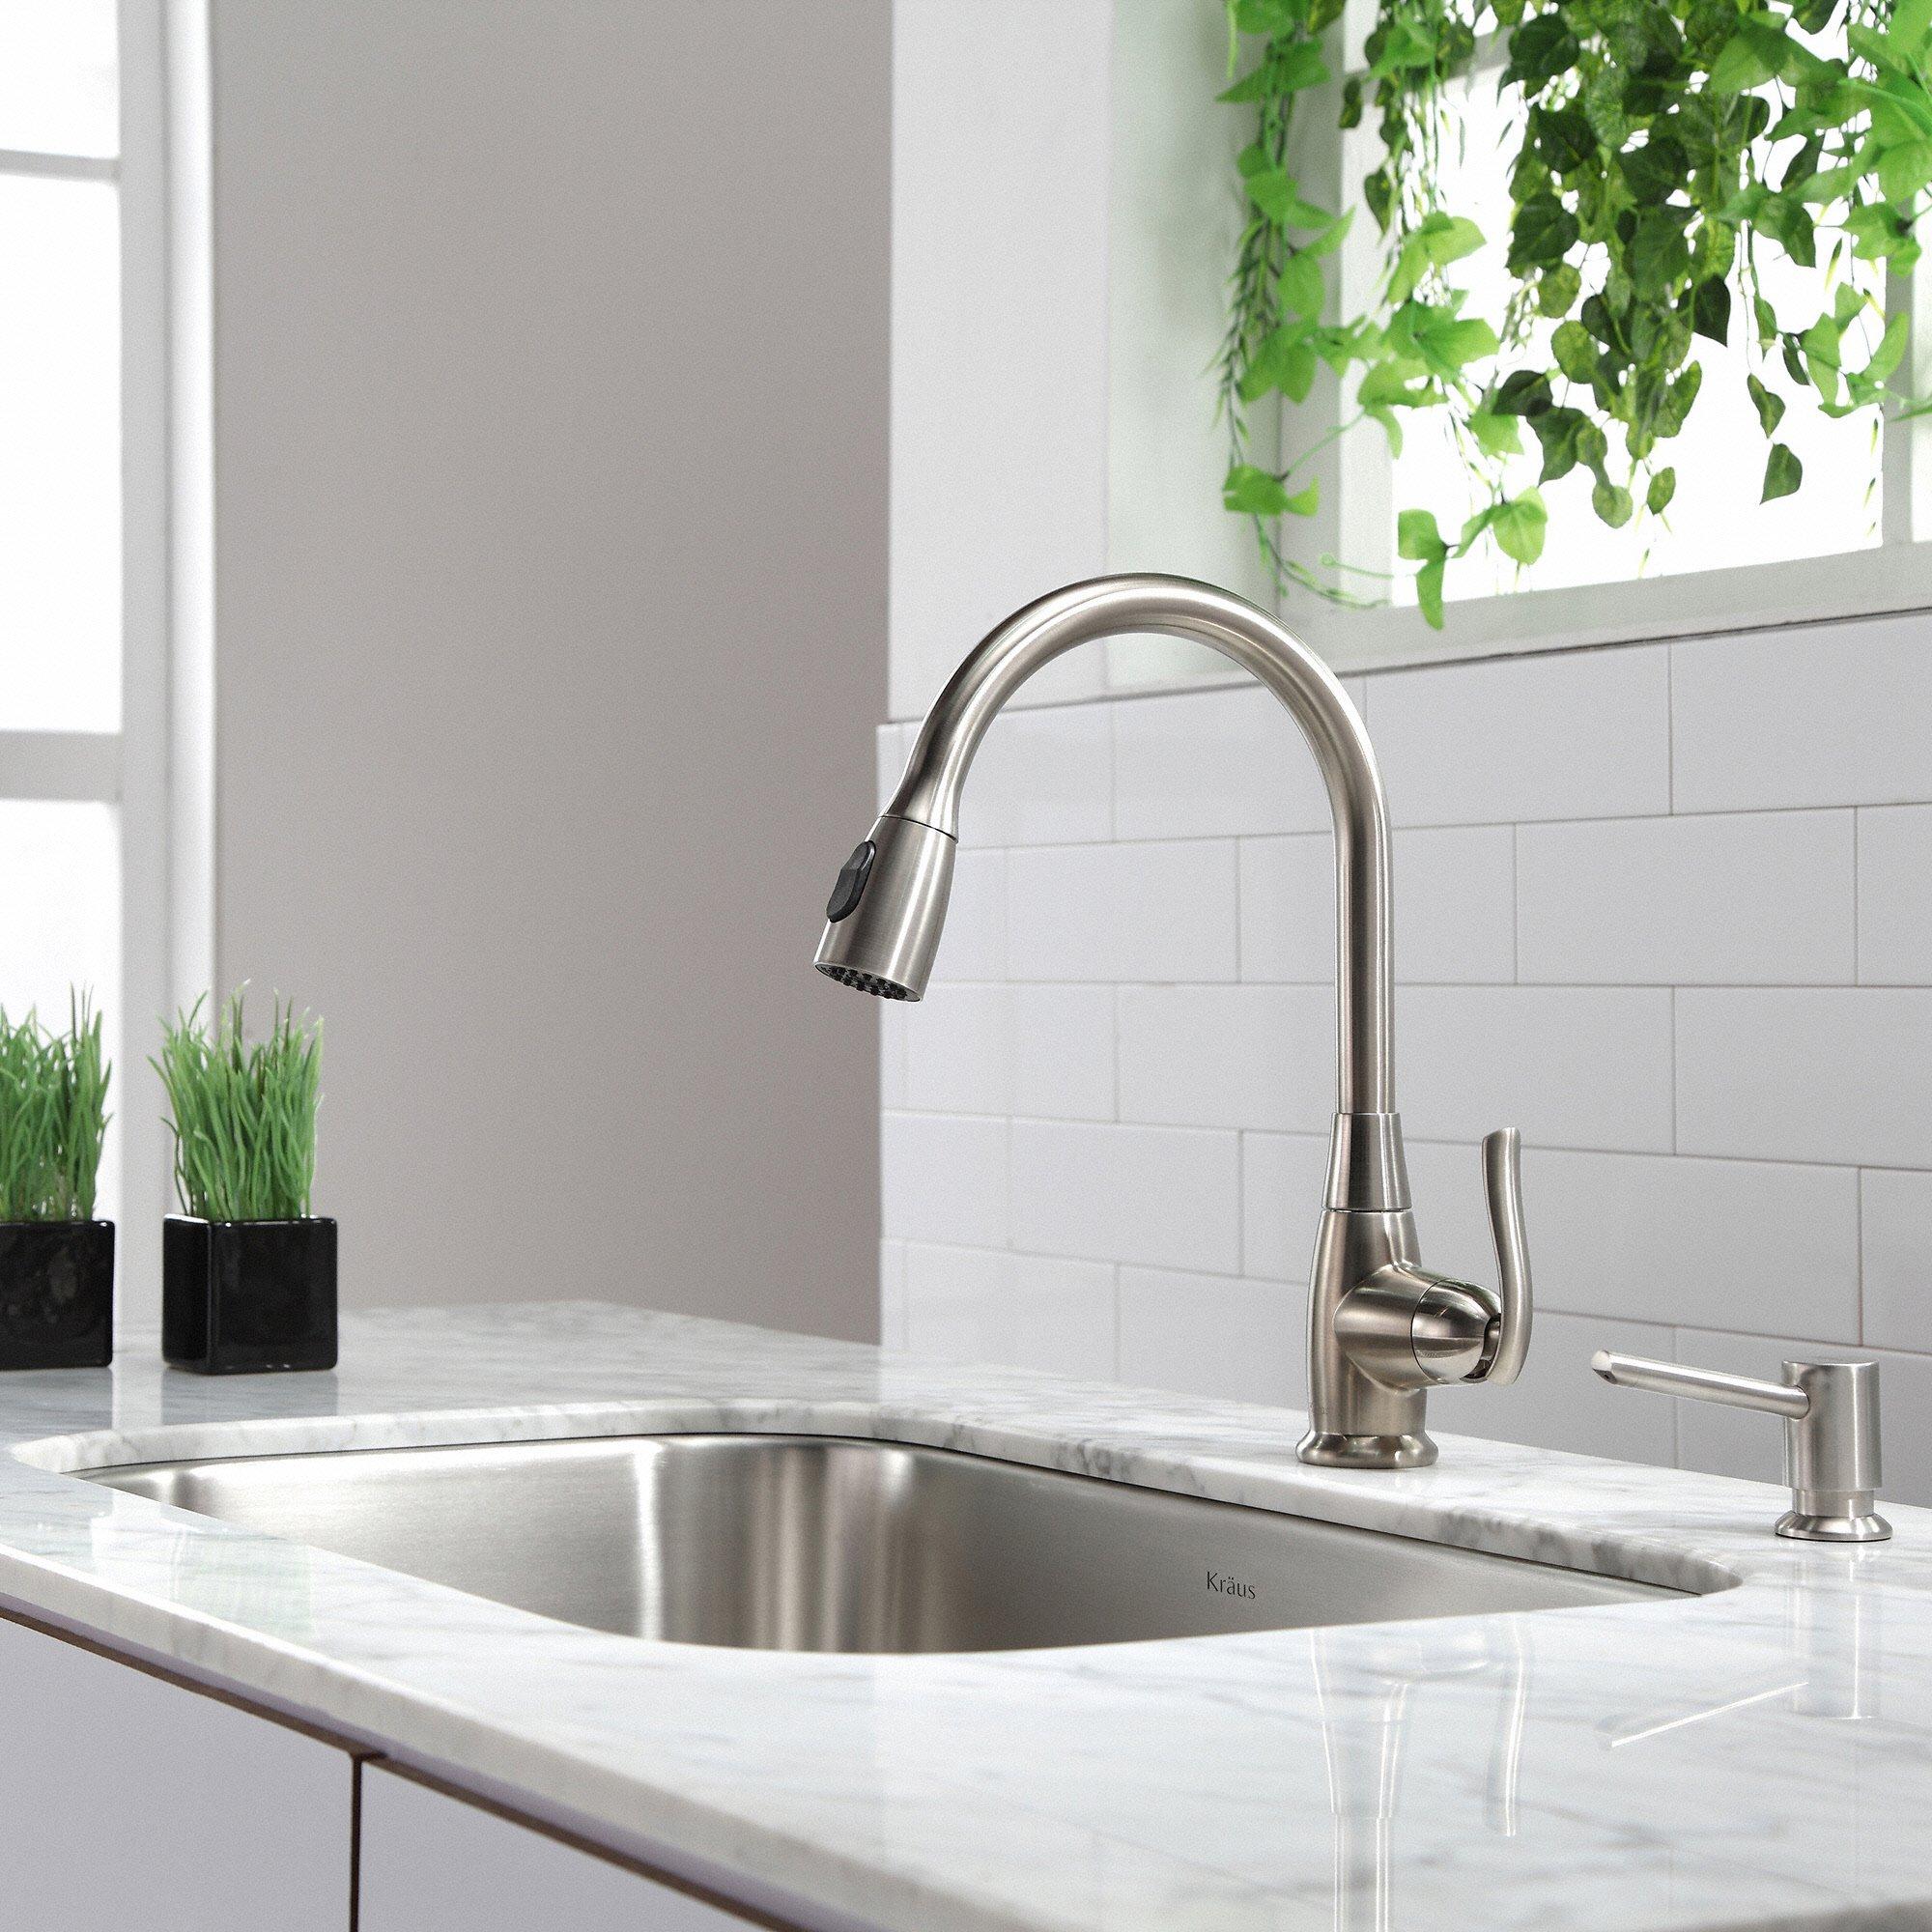 Kraus KBU14 31-1/2 inch Undermount Single Bowl 16-gauge Stainless Steel Kitchen Sink by Kraus (Image #13)